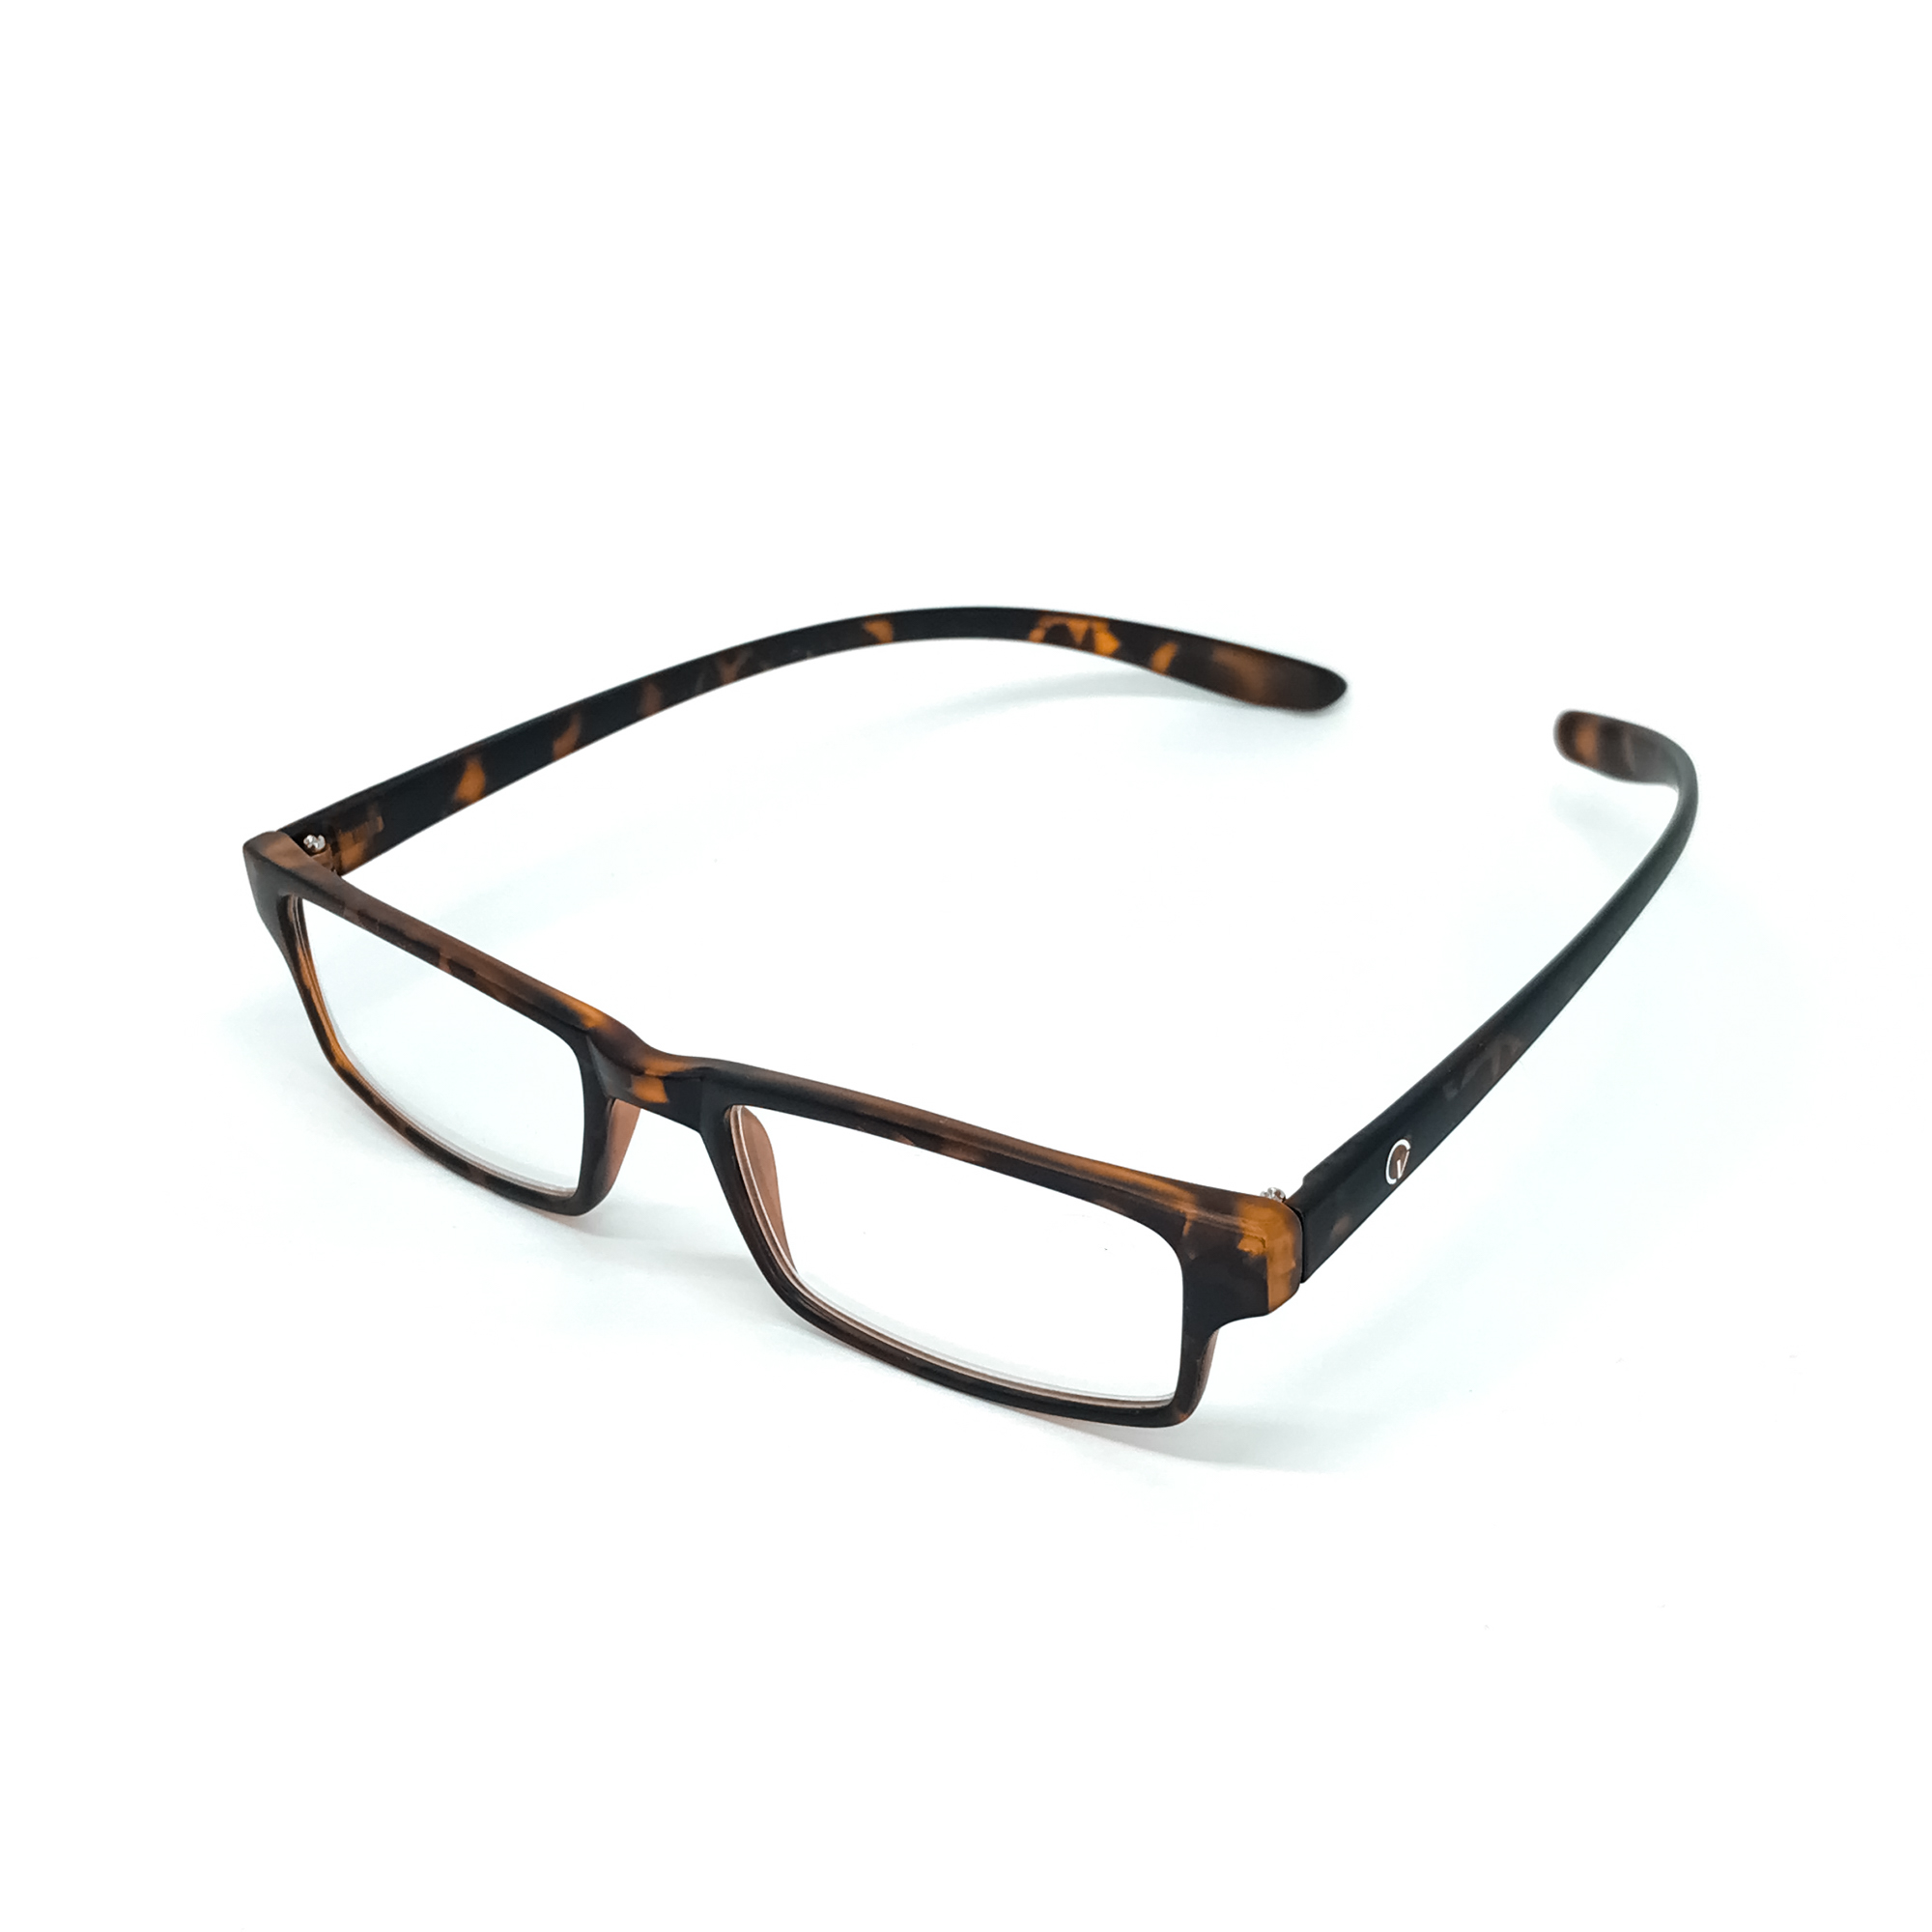 0869023 - Óculos Leitura Retangular Demi +2,00 - Contém 1 Peça